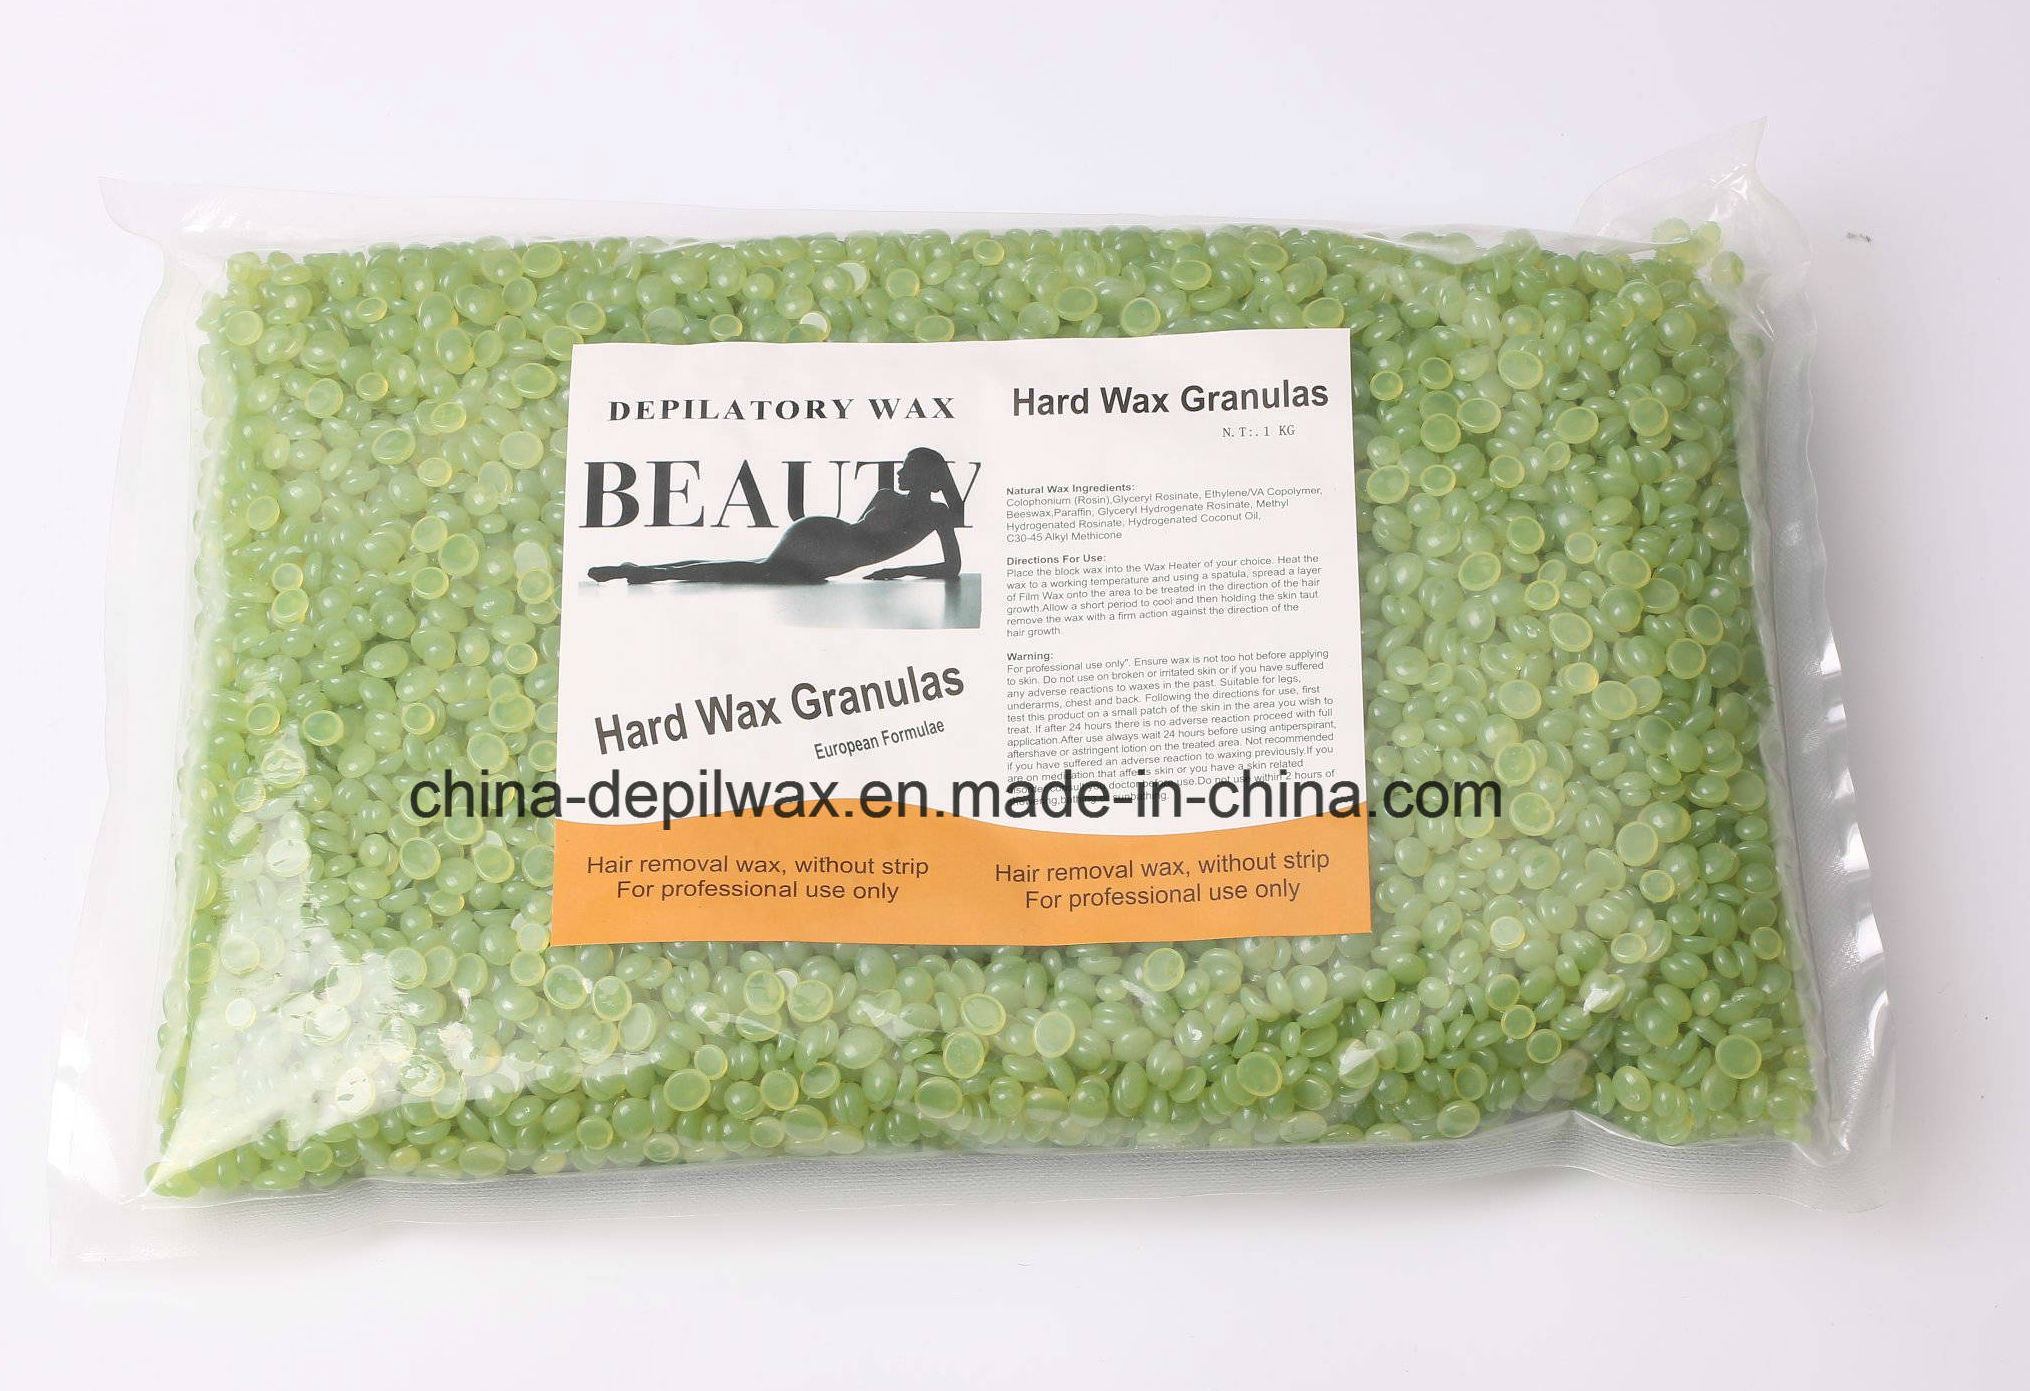 Depilatory Wax Aloe Vera Hard Wax Pellets